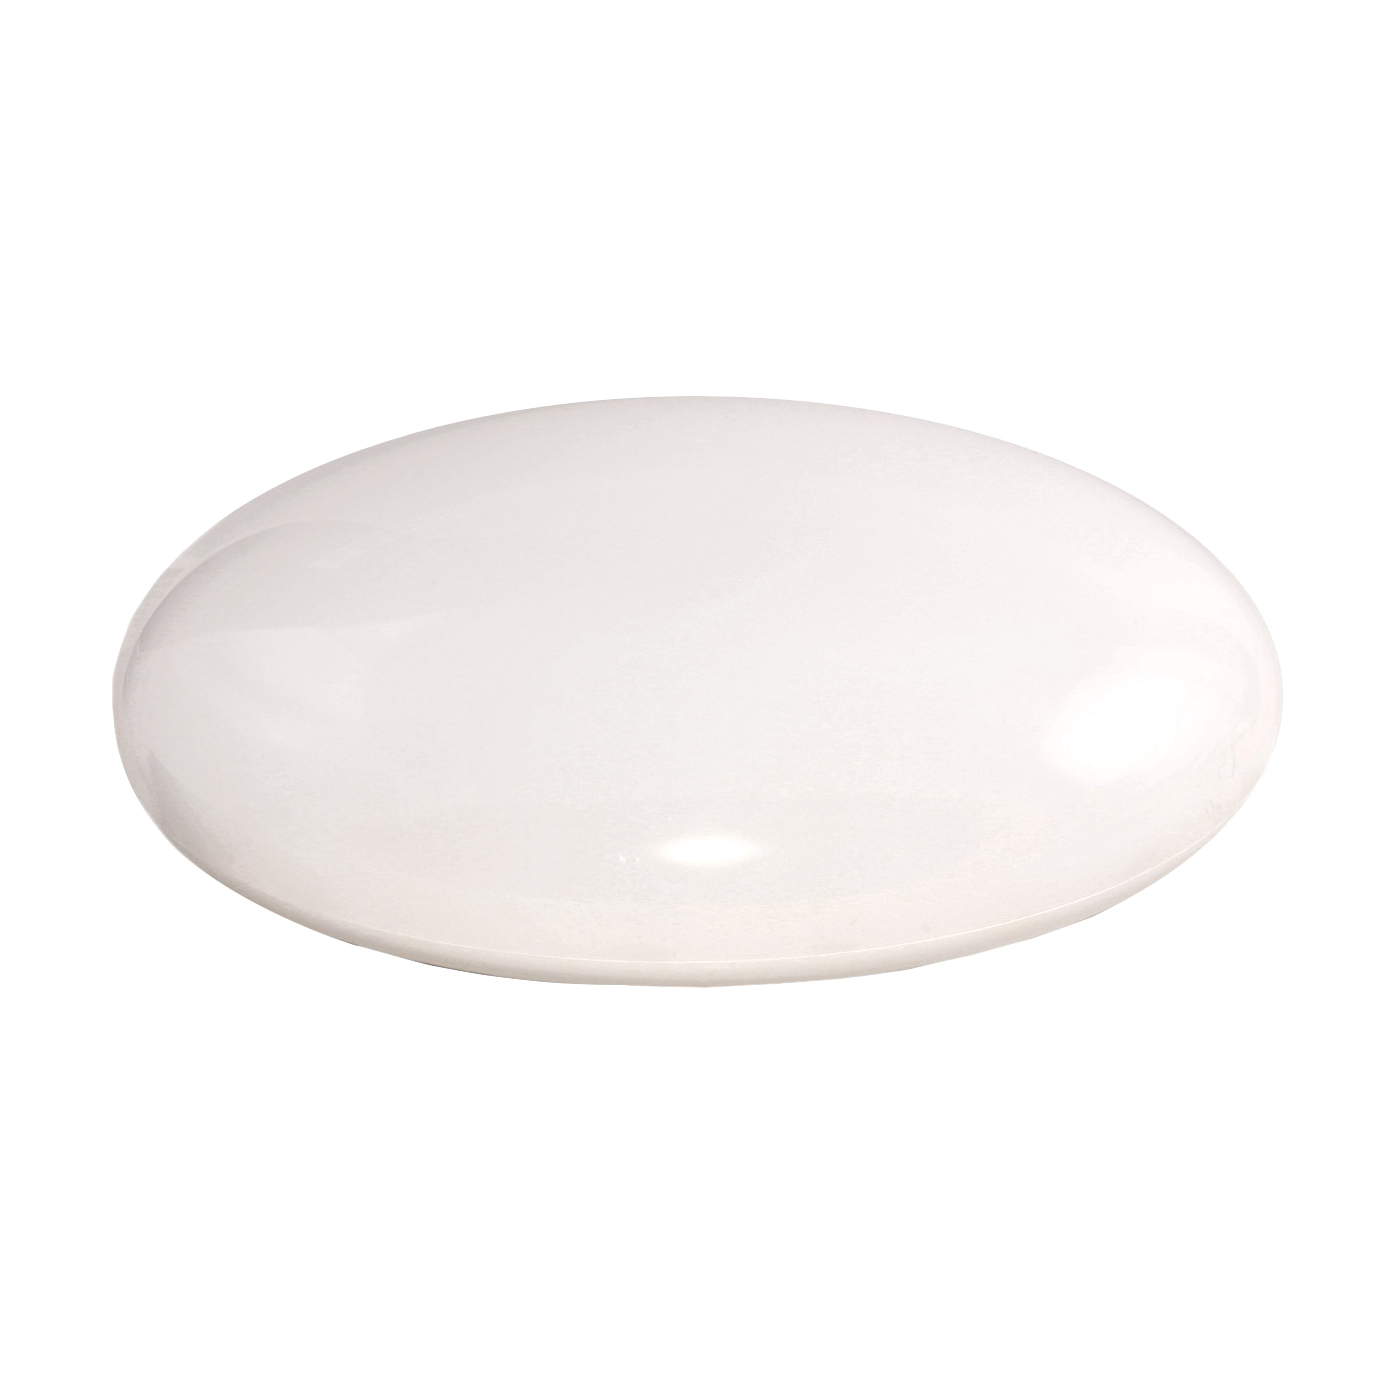 Picture of Sylvania 75123 Ceiling Light, 120 V, 31 W, LED Lamp, 2500 Lumens, 2700 K Color Temp